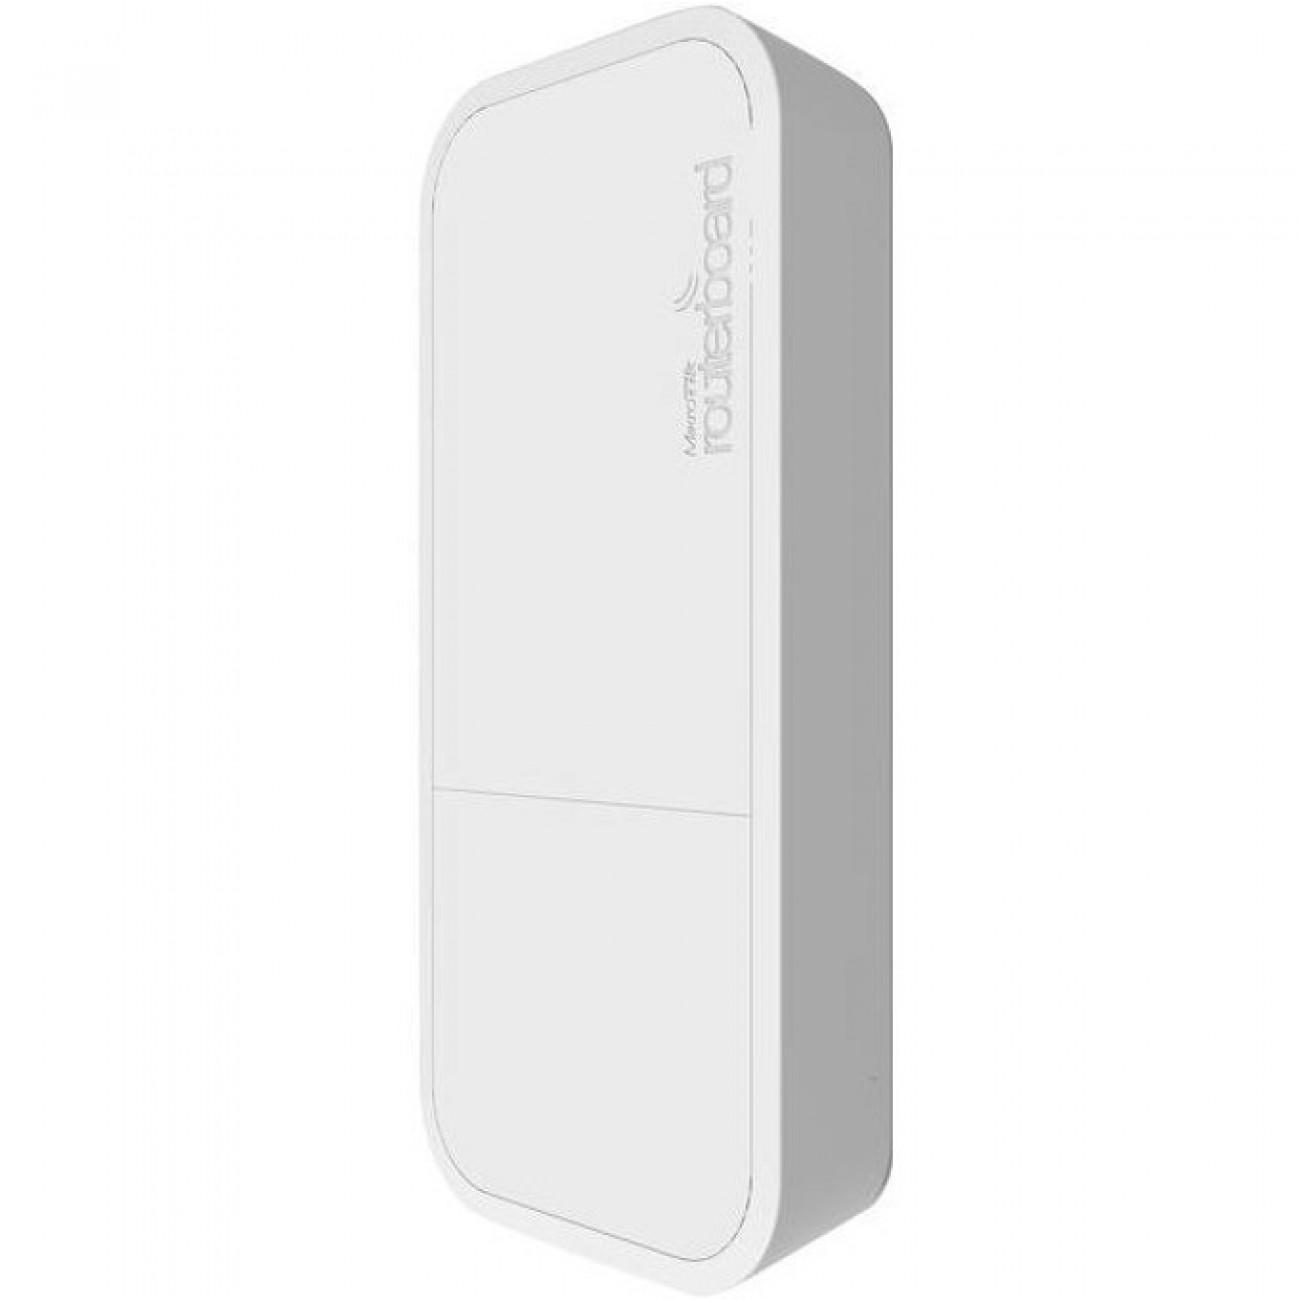 Access point/Аксес пойнт Mikrotik wAP ac, 2.4GHz/5GHz, 1x Lan1000, PoE, 2x вътрешни антени в Аксеспойнт / Рипийтър -    Alleop